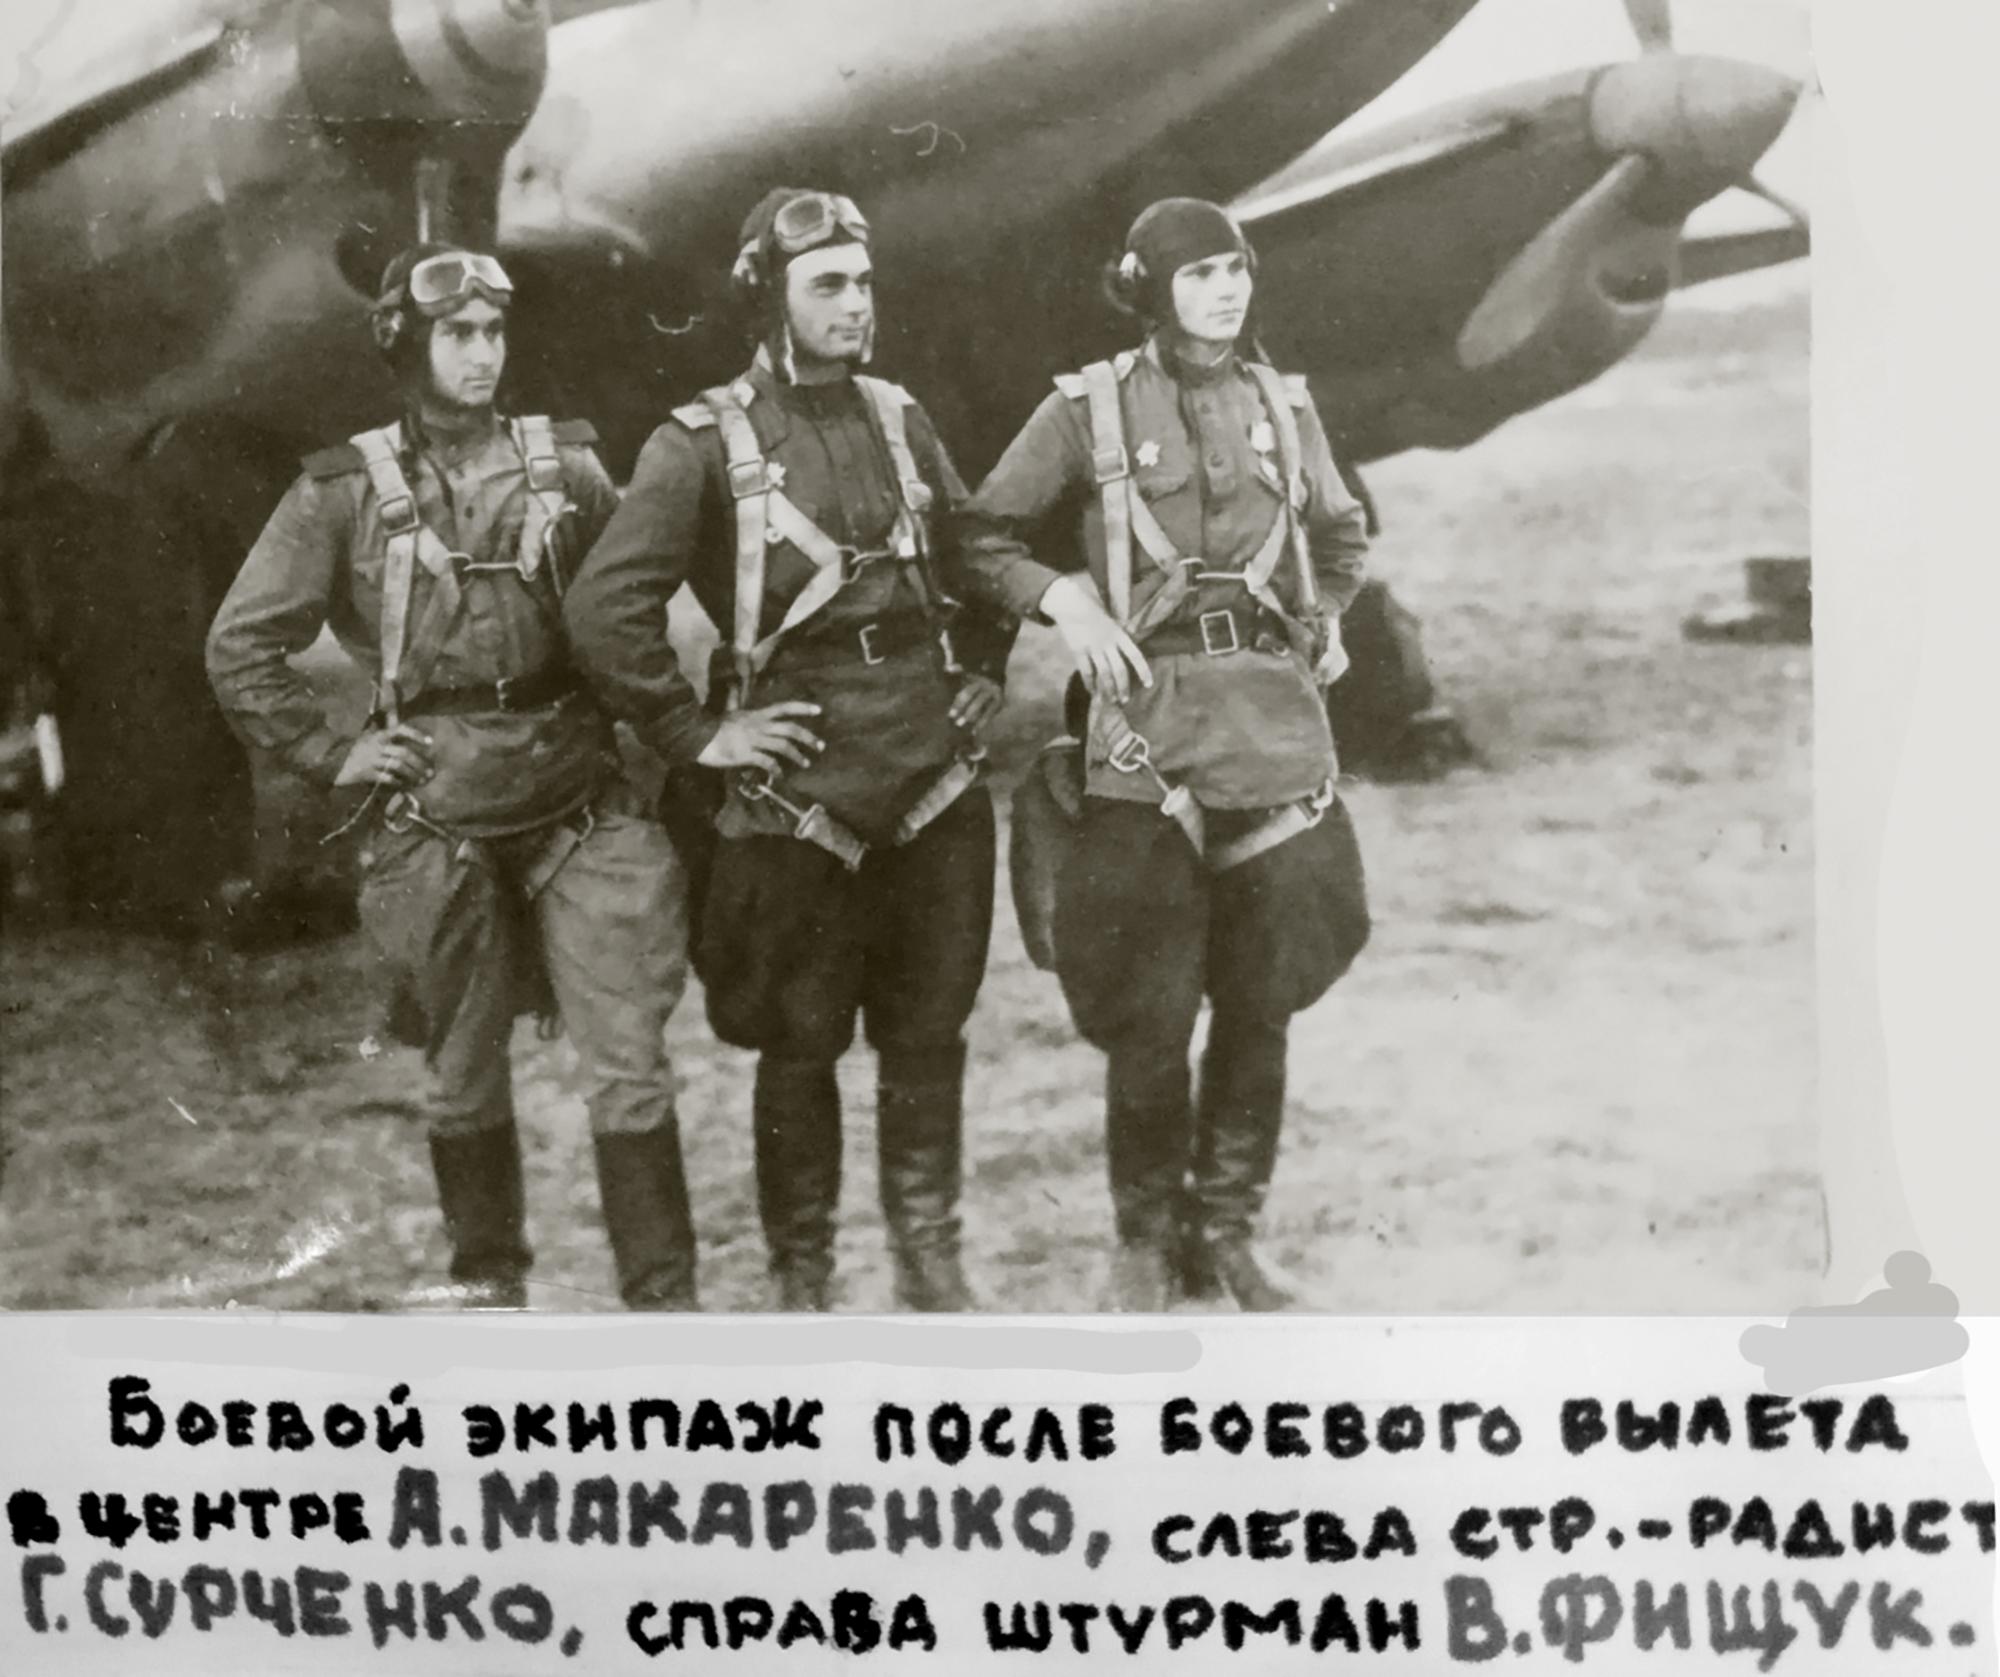 Aircrew Soviet 160GvBAP with G Surchenko,A Makarenko and V Fishchuk 01